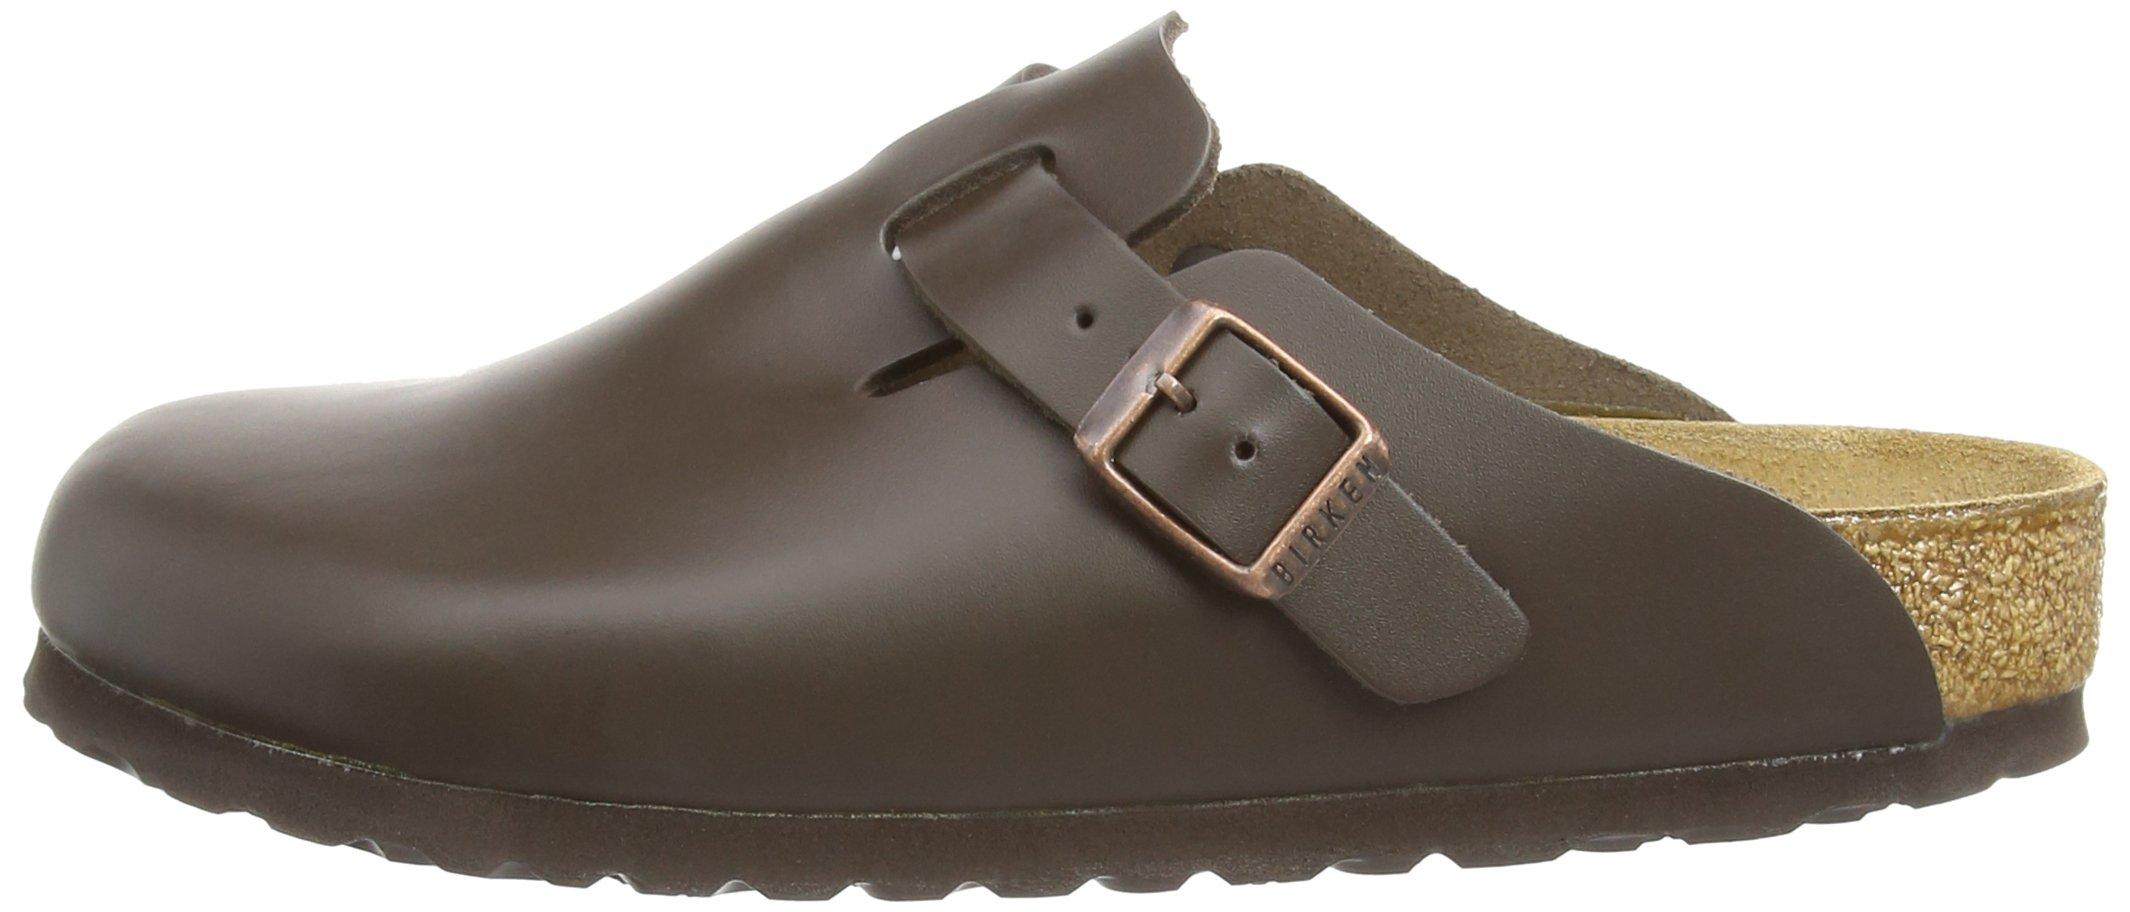 Birkenstock Boston, Unisex Adults' Clogs, Dark Brown Leather,8 UK by Birkenstock (Image #5)